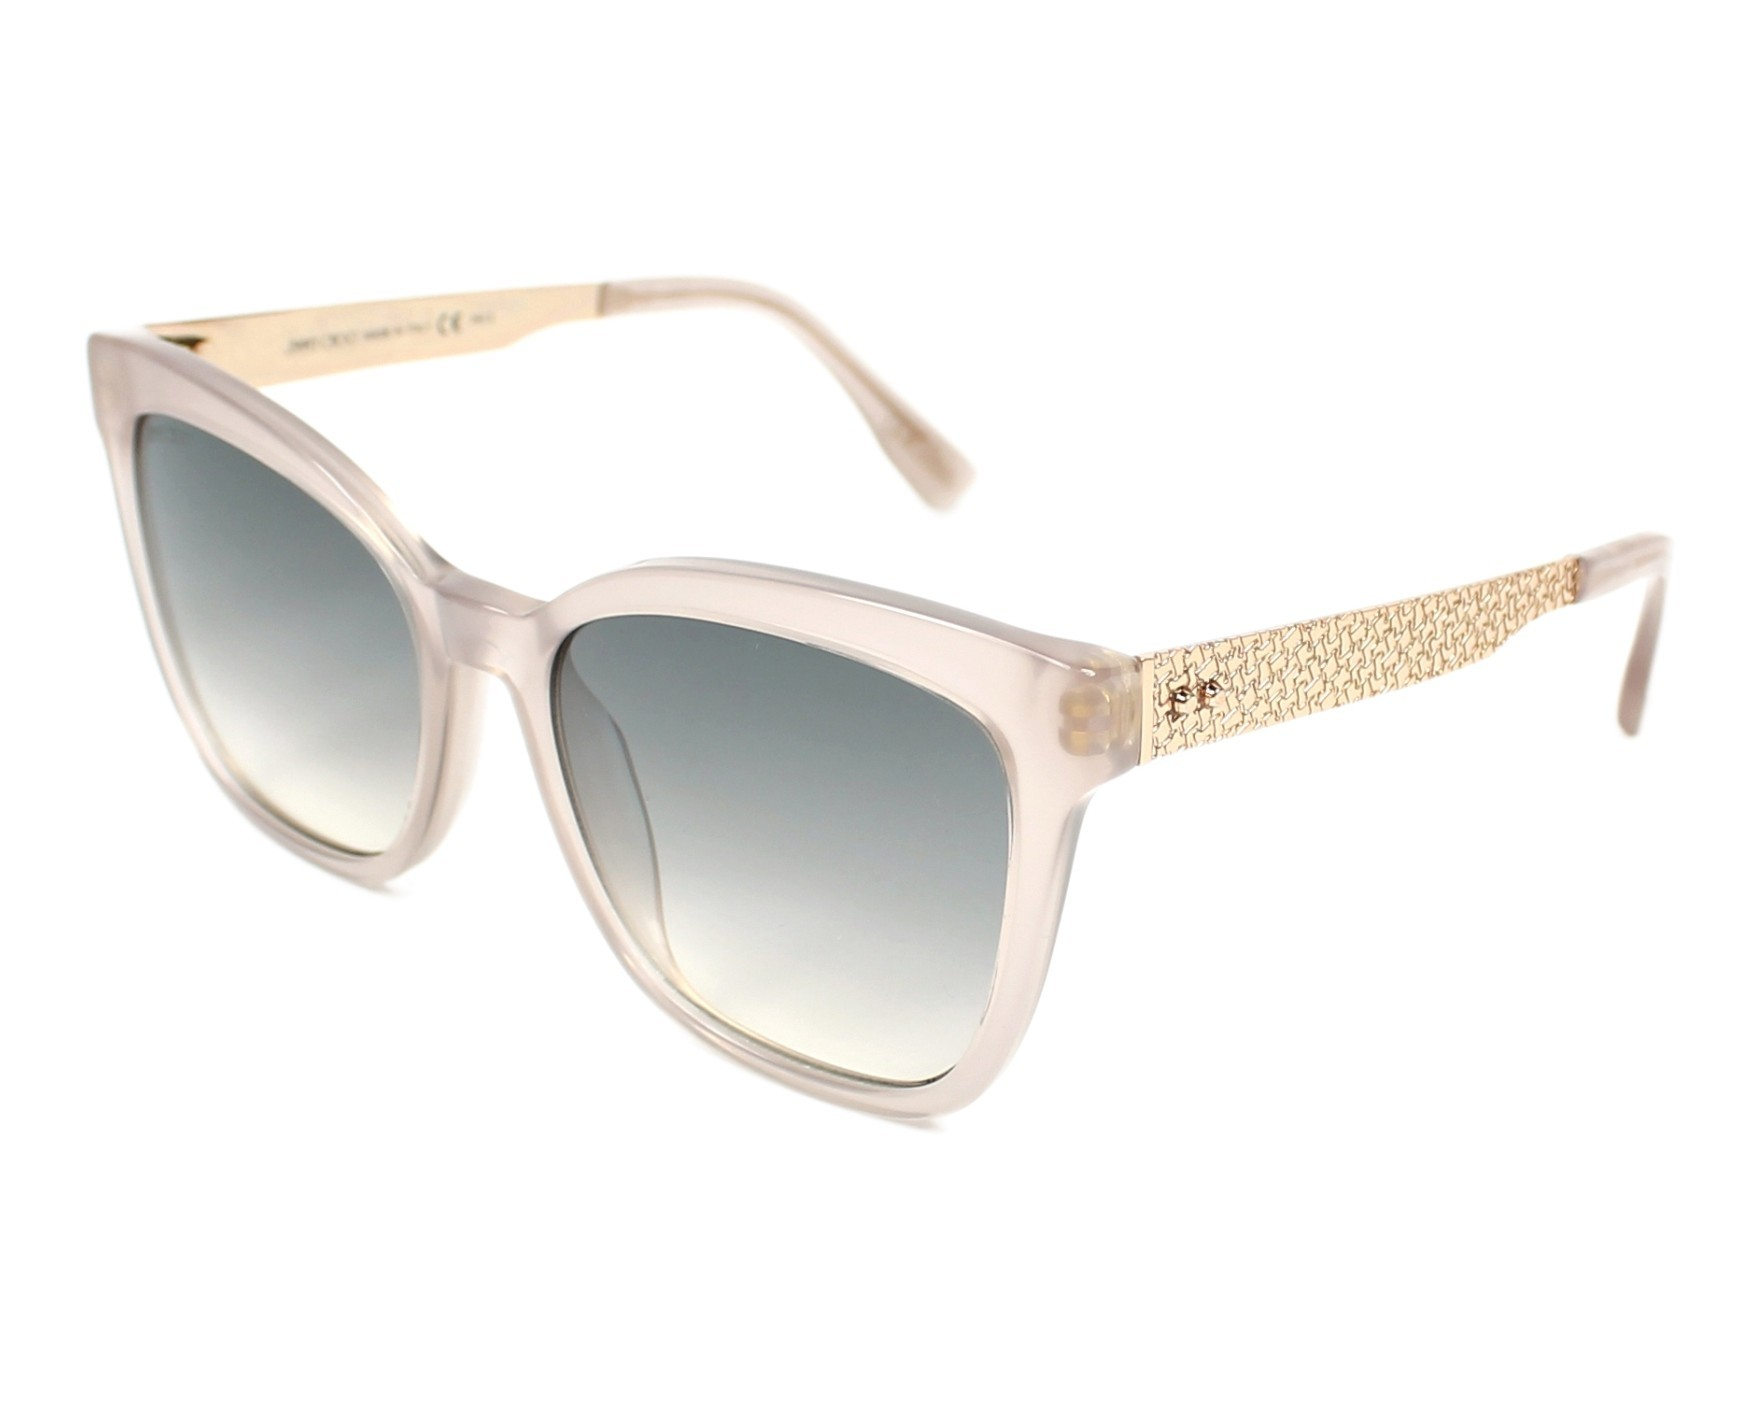 Jimmy Choo Junia/S Sonnenbrille Rosa und Gold PR5 55mm HhMPdpQY